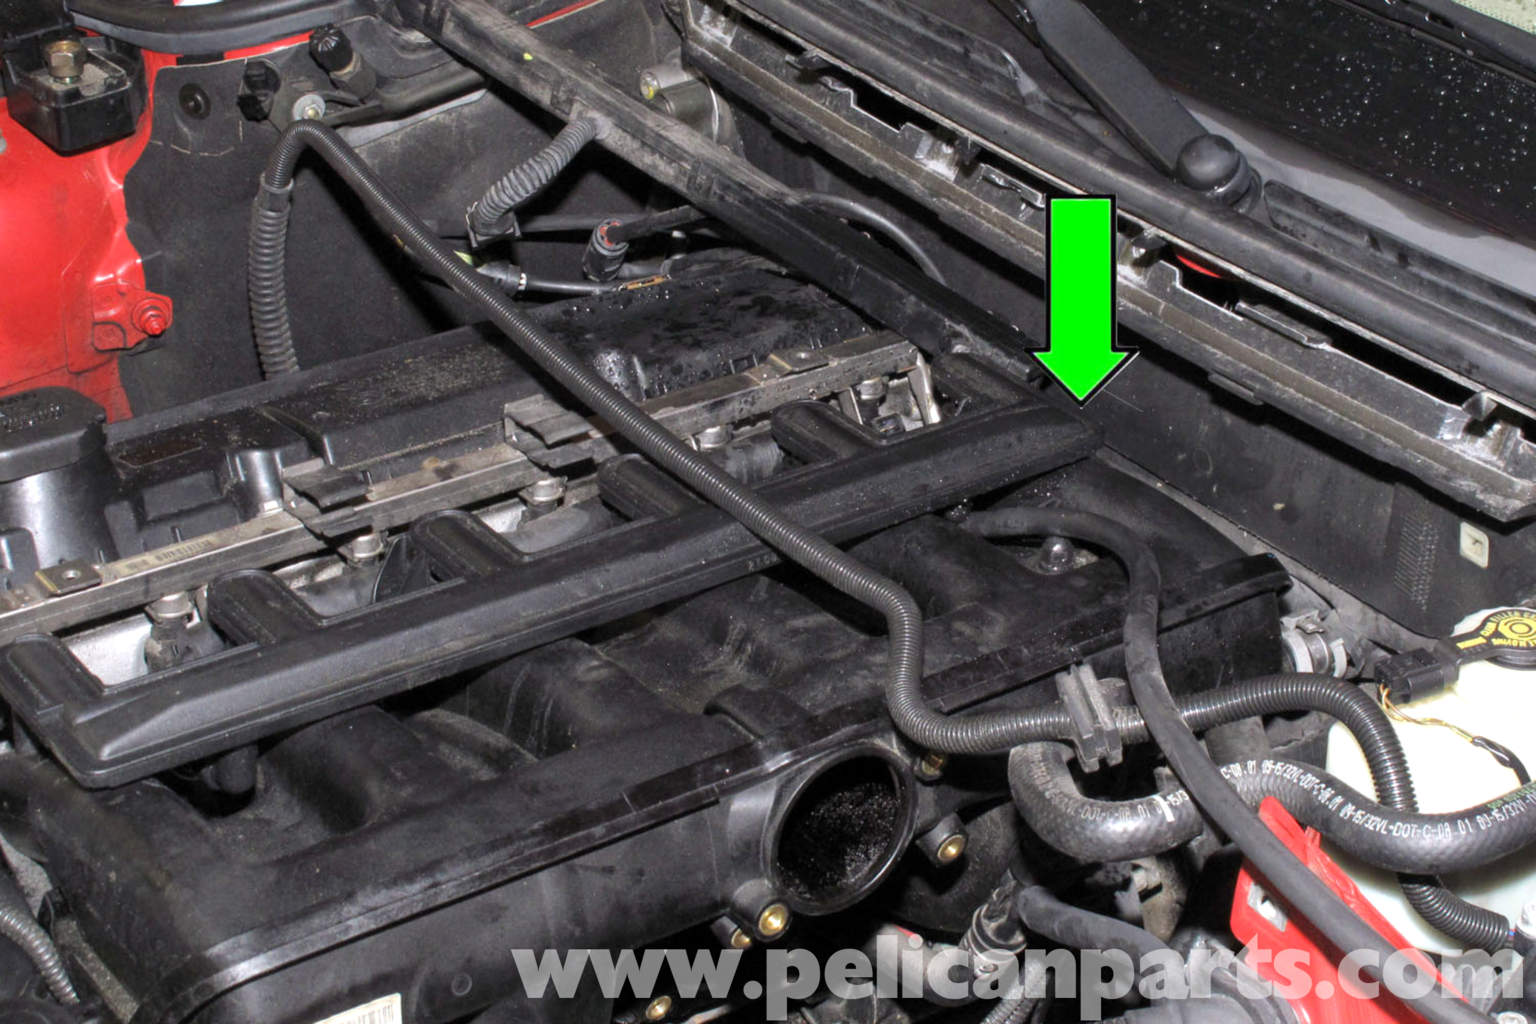 2007 Nissan Sentra Engine Parts Diagram